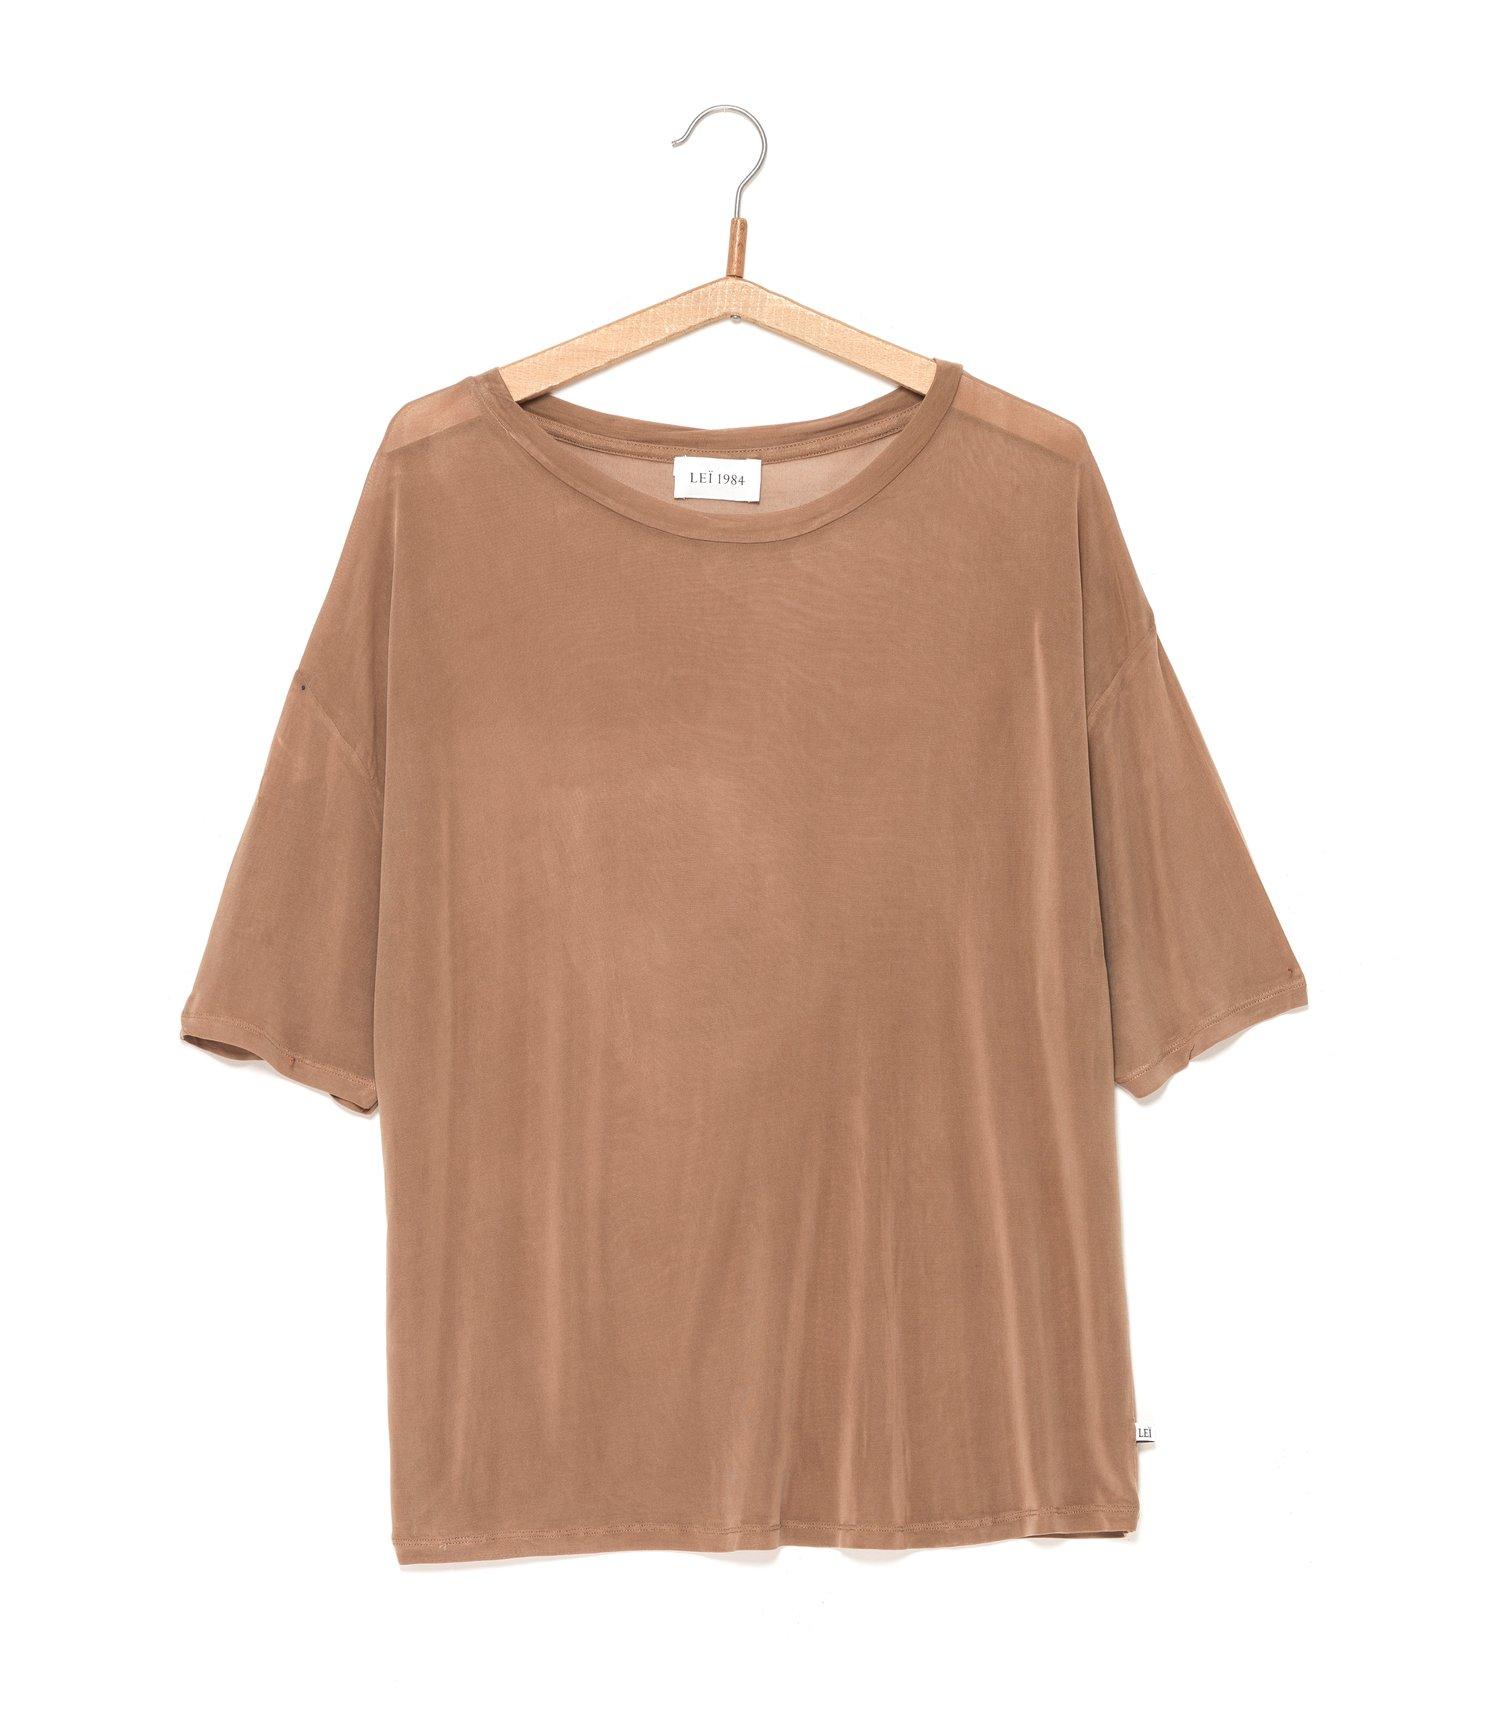 Image of Tee-shirt cupro AMANDE 85€ -50%